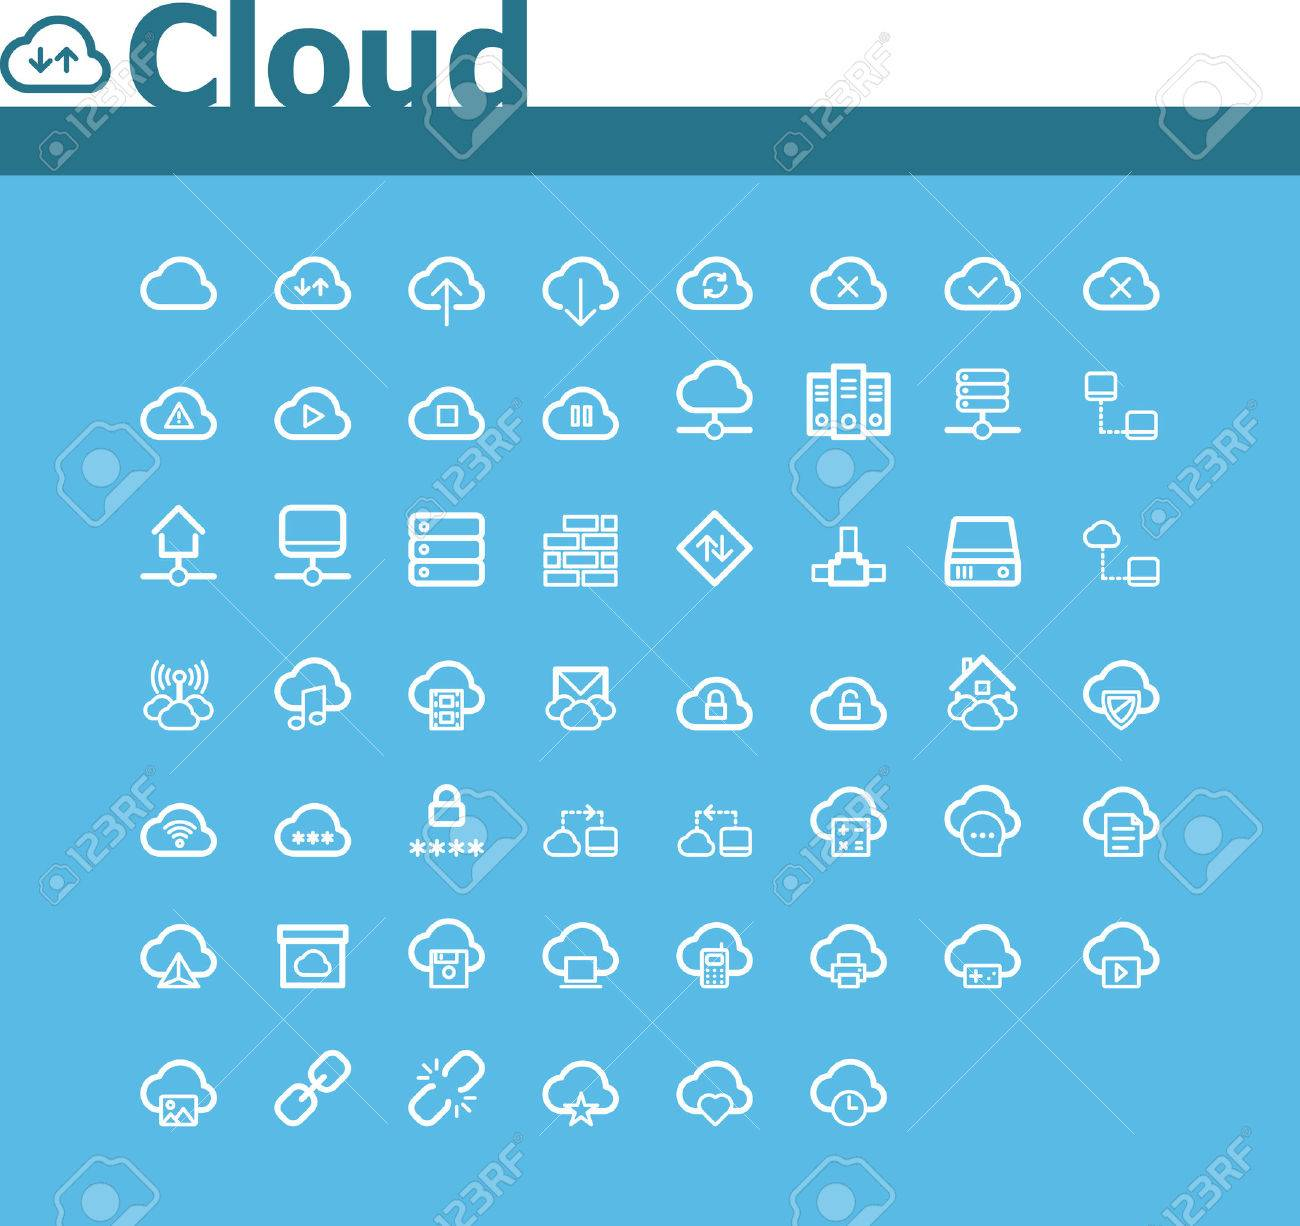 Cloud computing icon set Stock Vector - 24902245